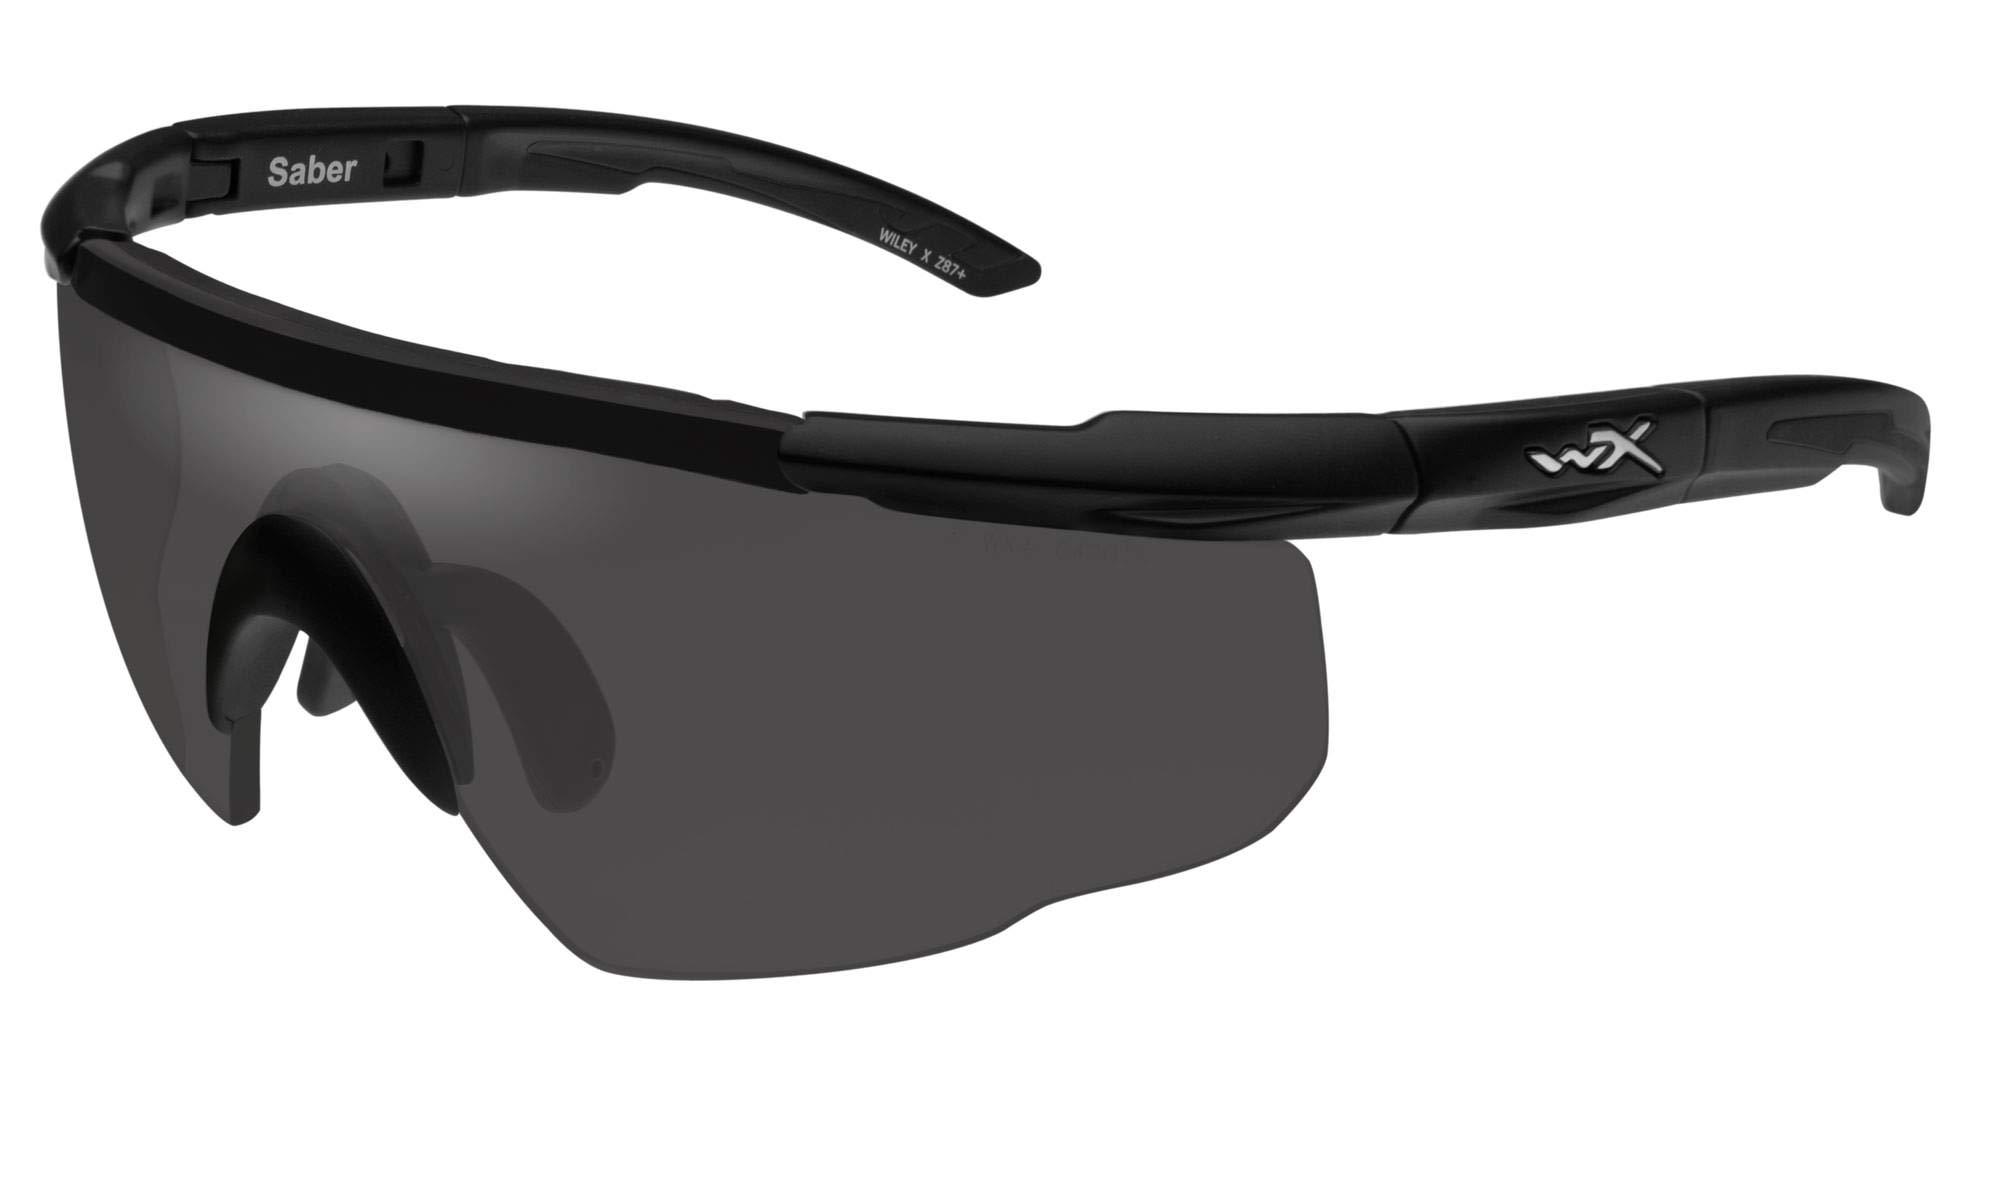 Wiley X Saber Advanced Sunglasses, Smoke Grey, Matte Black by Wiley X